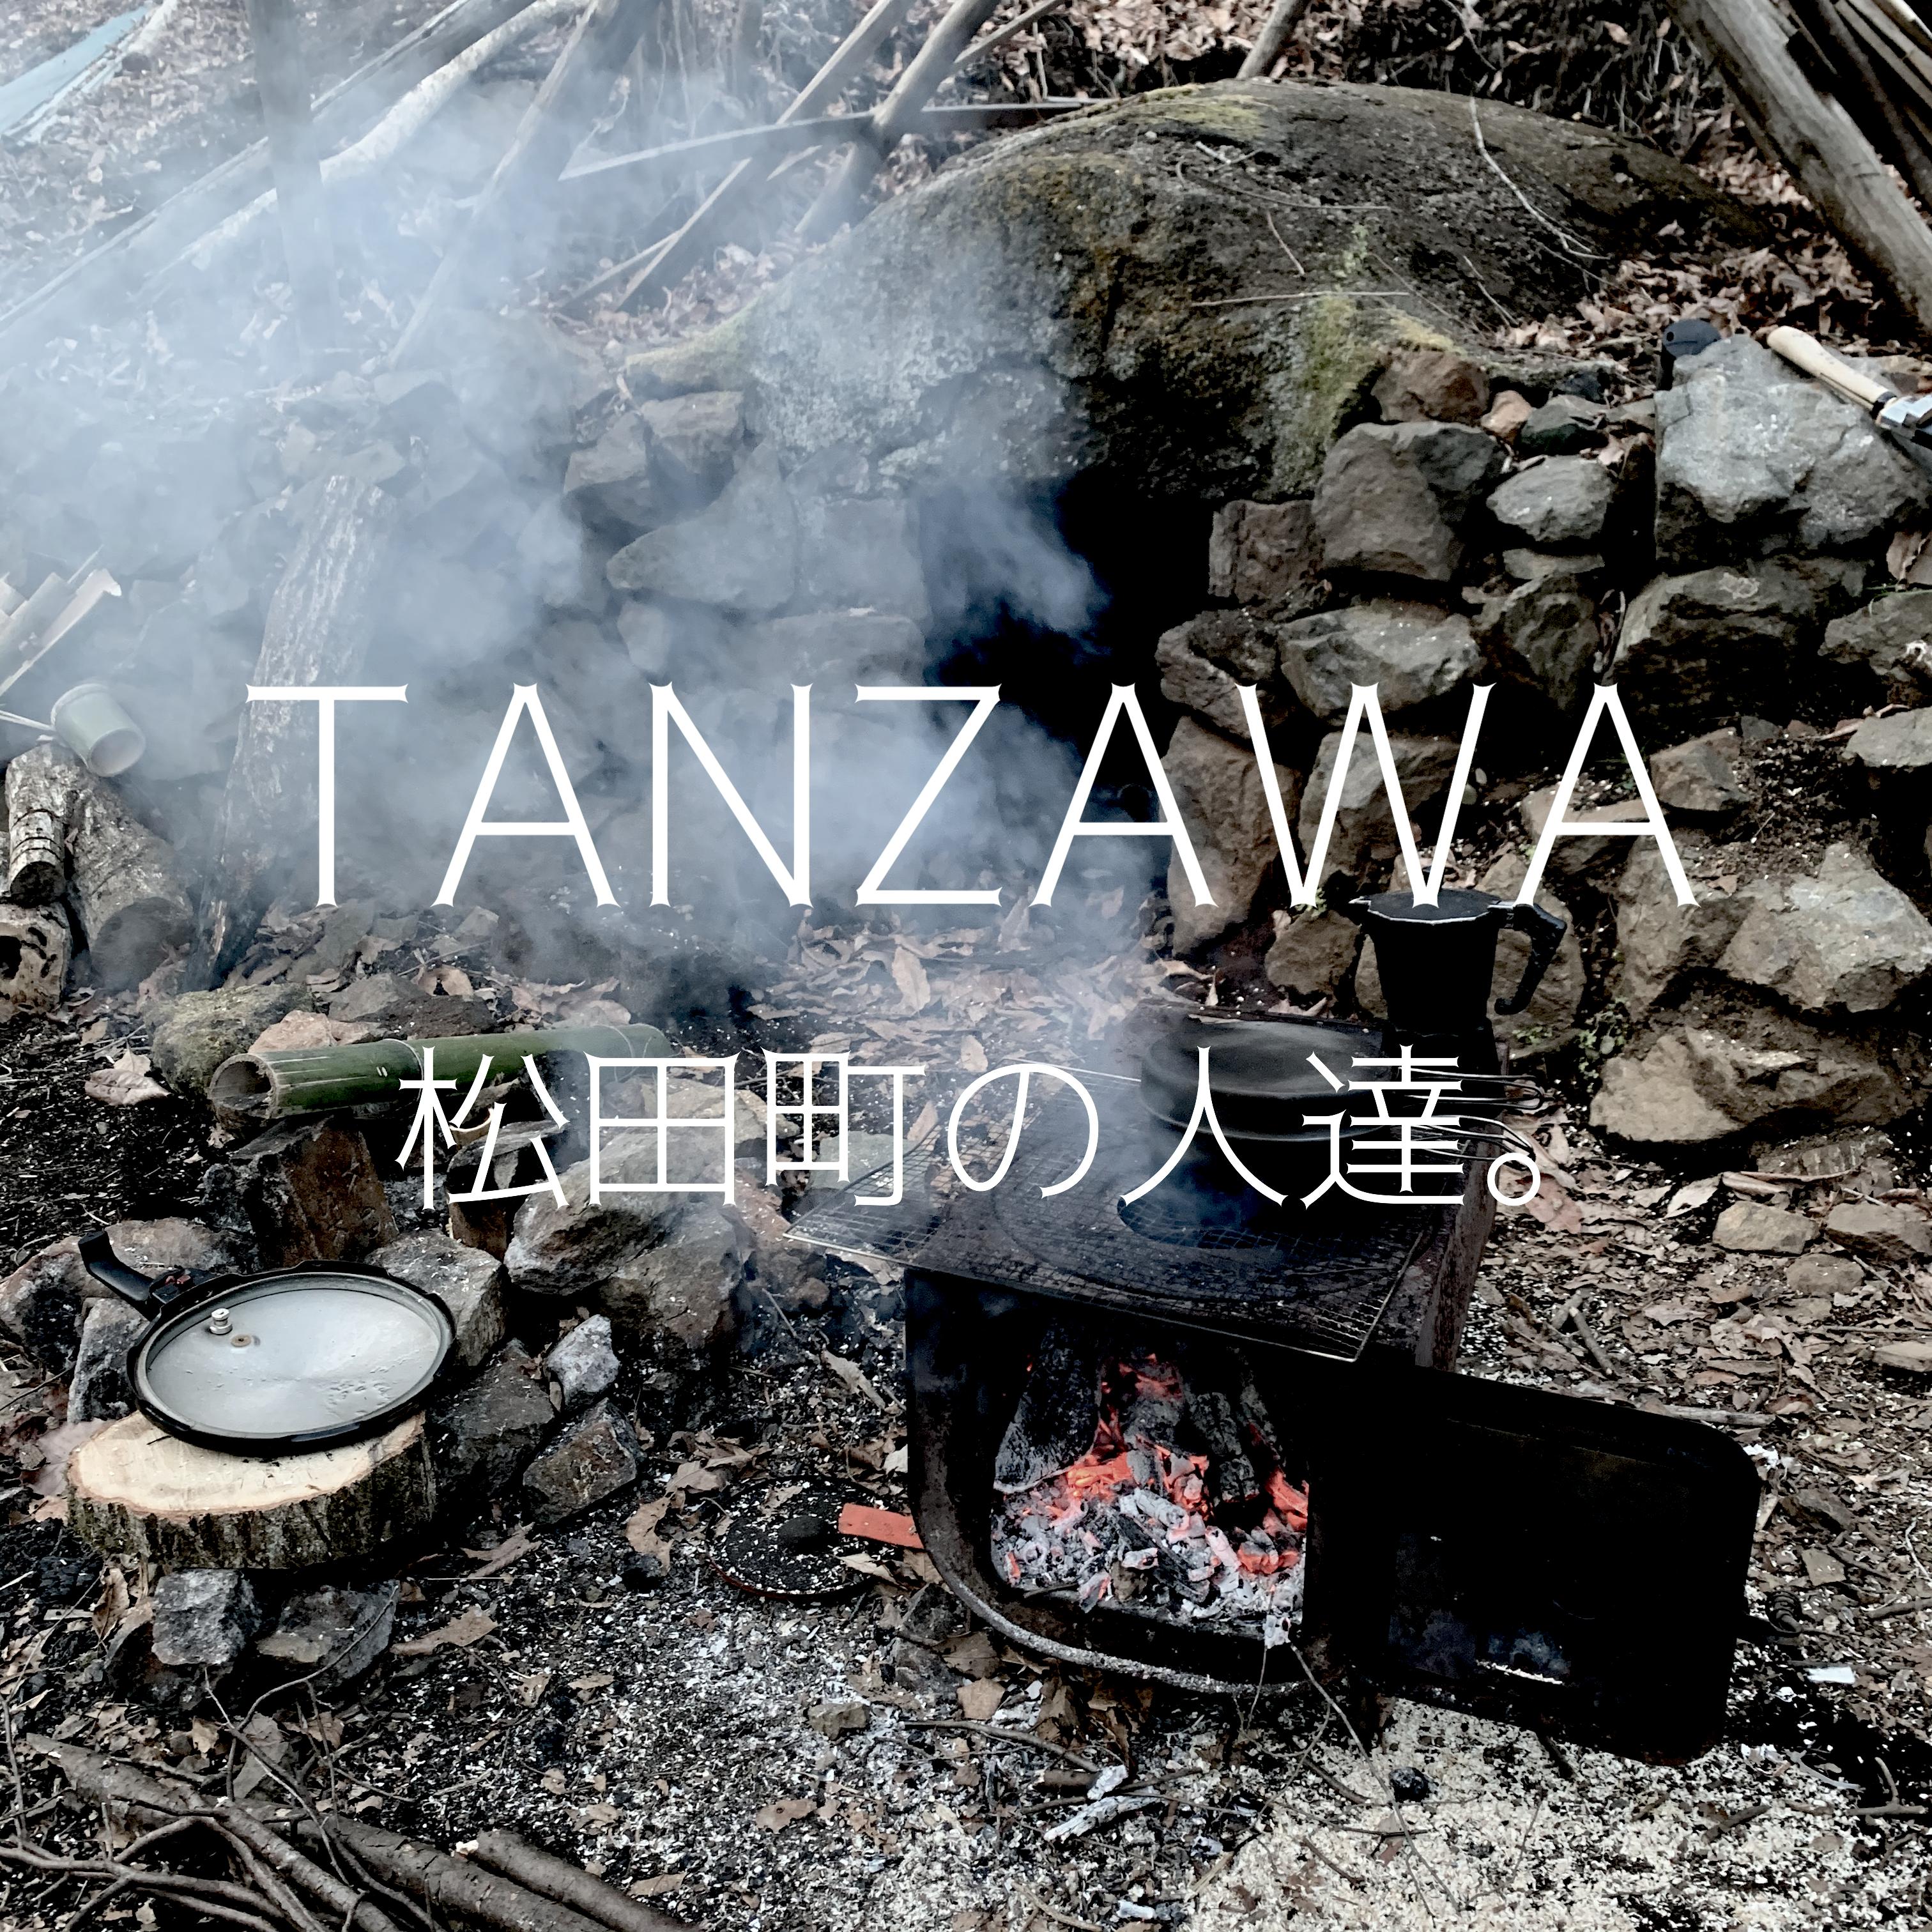 TANZAWA 松田町の人達。